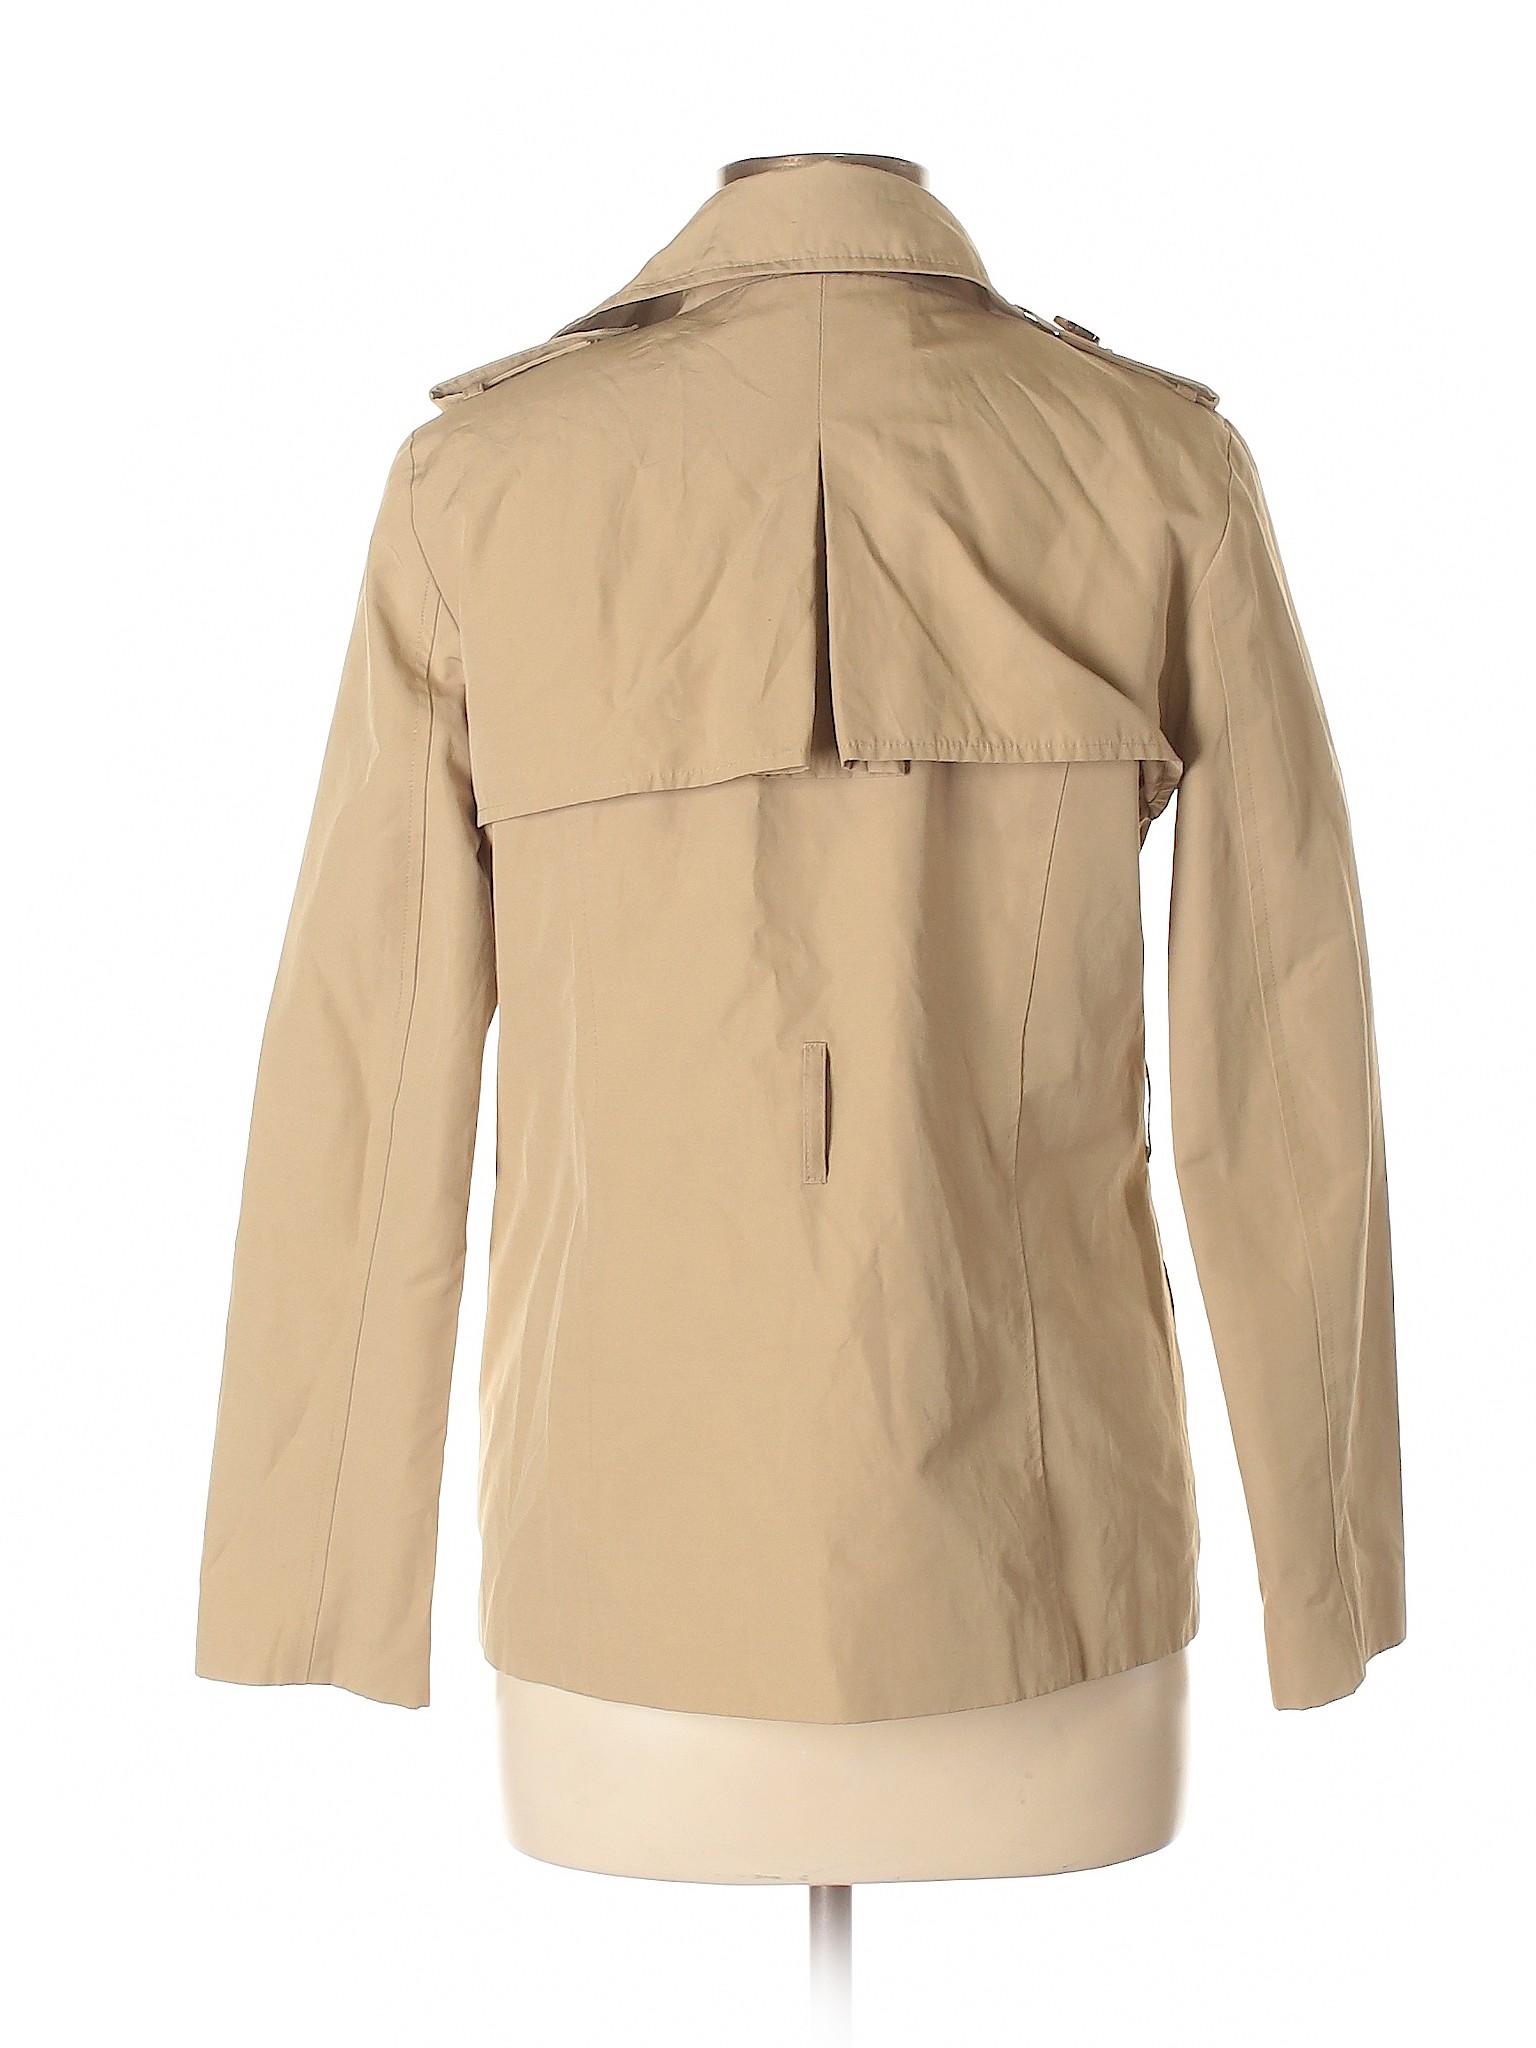 leisure Forever 21 Jacket leisure Boutique Boutique Hq6xwzWv